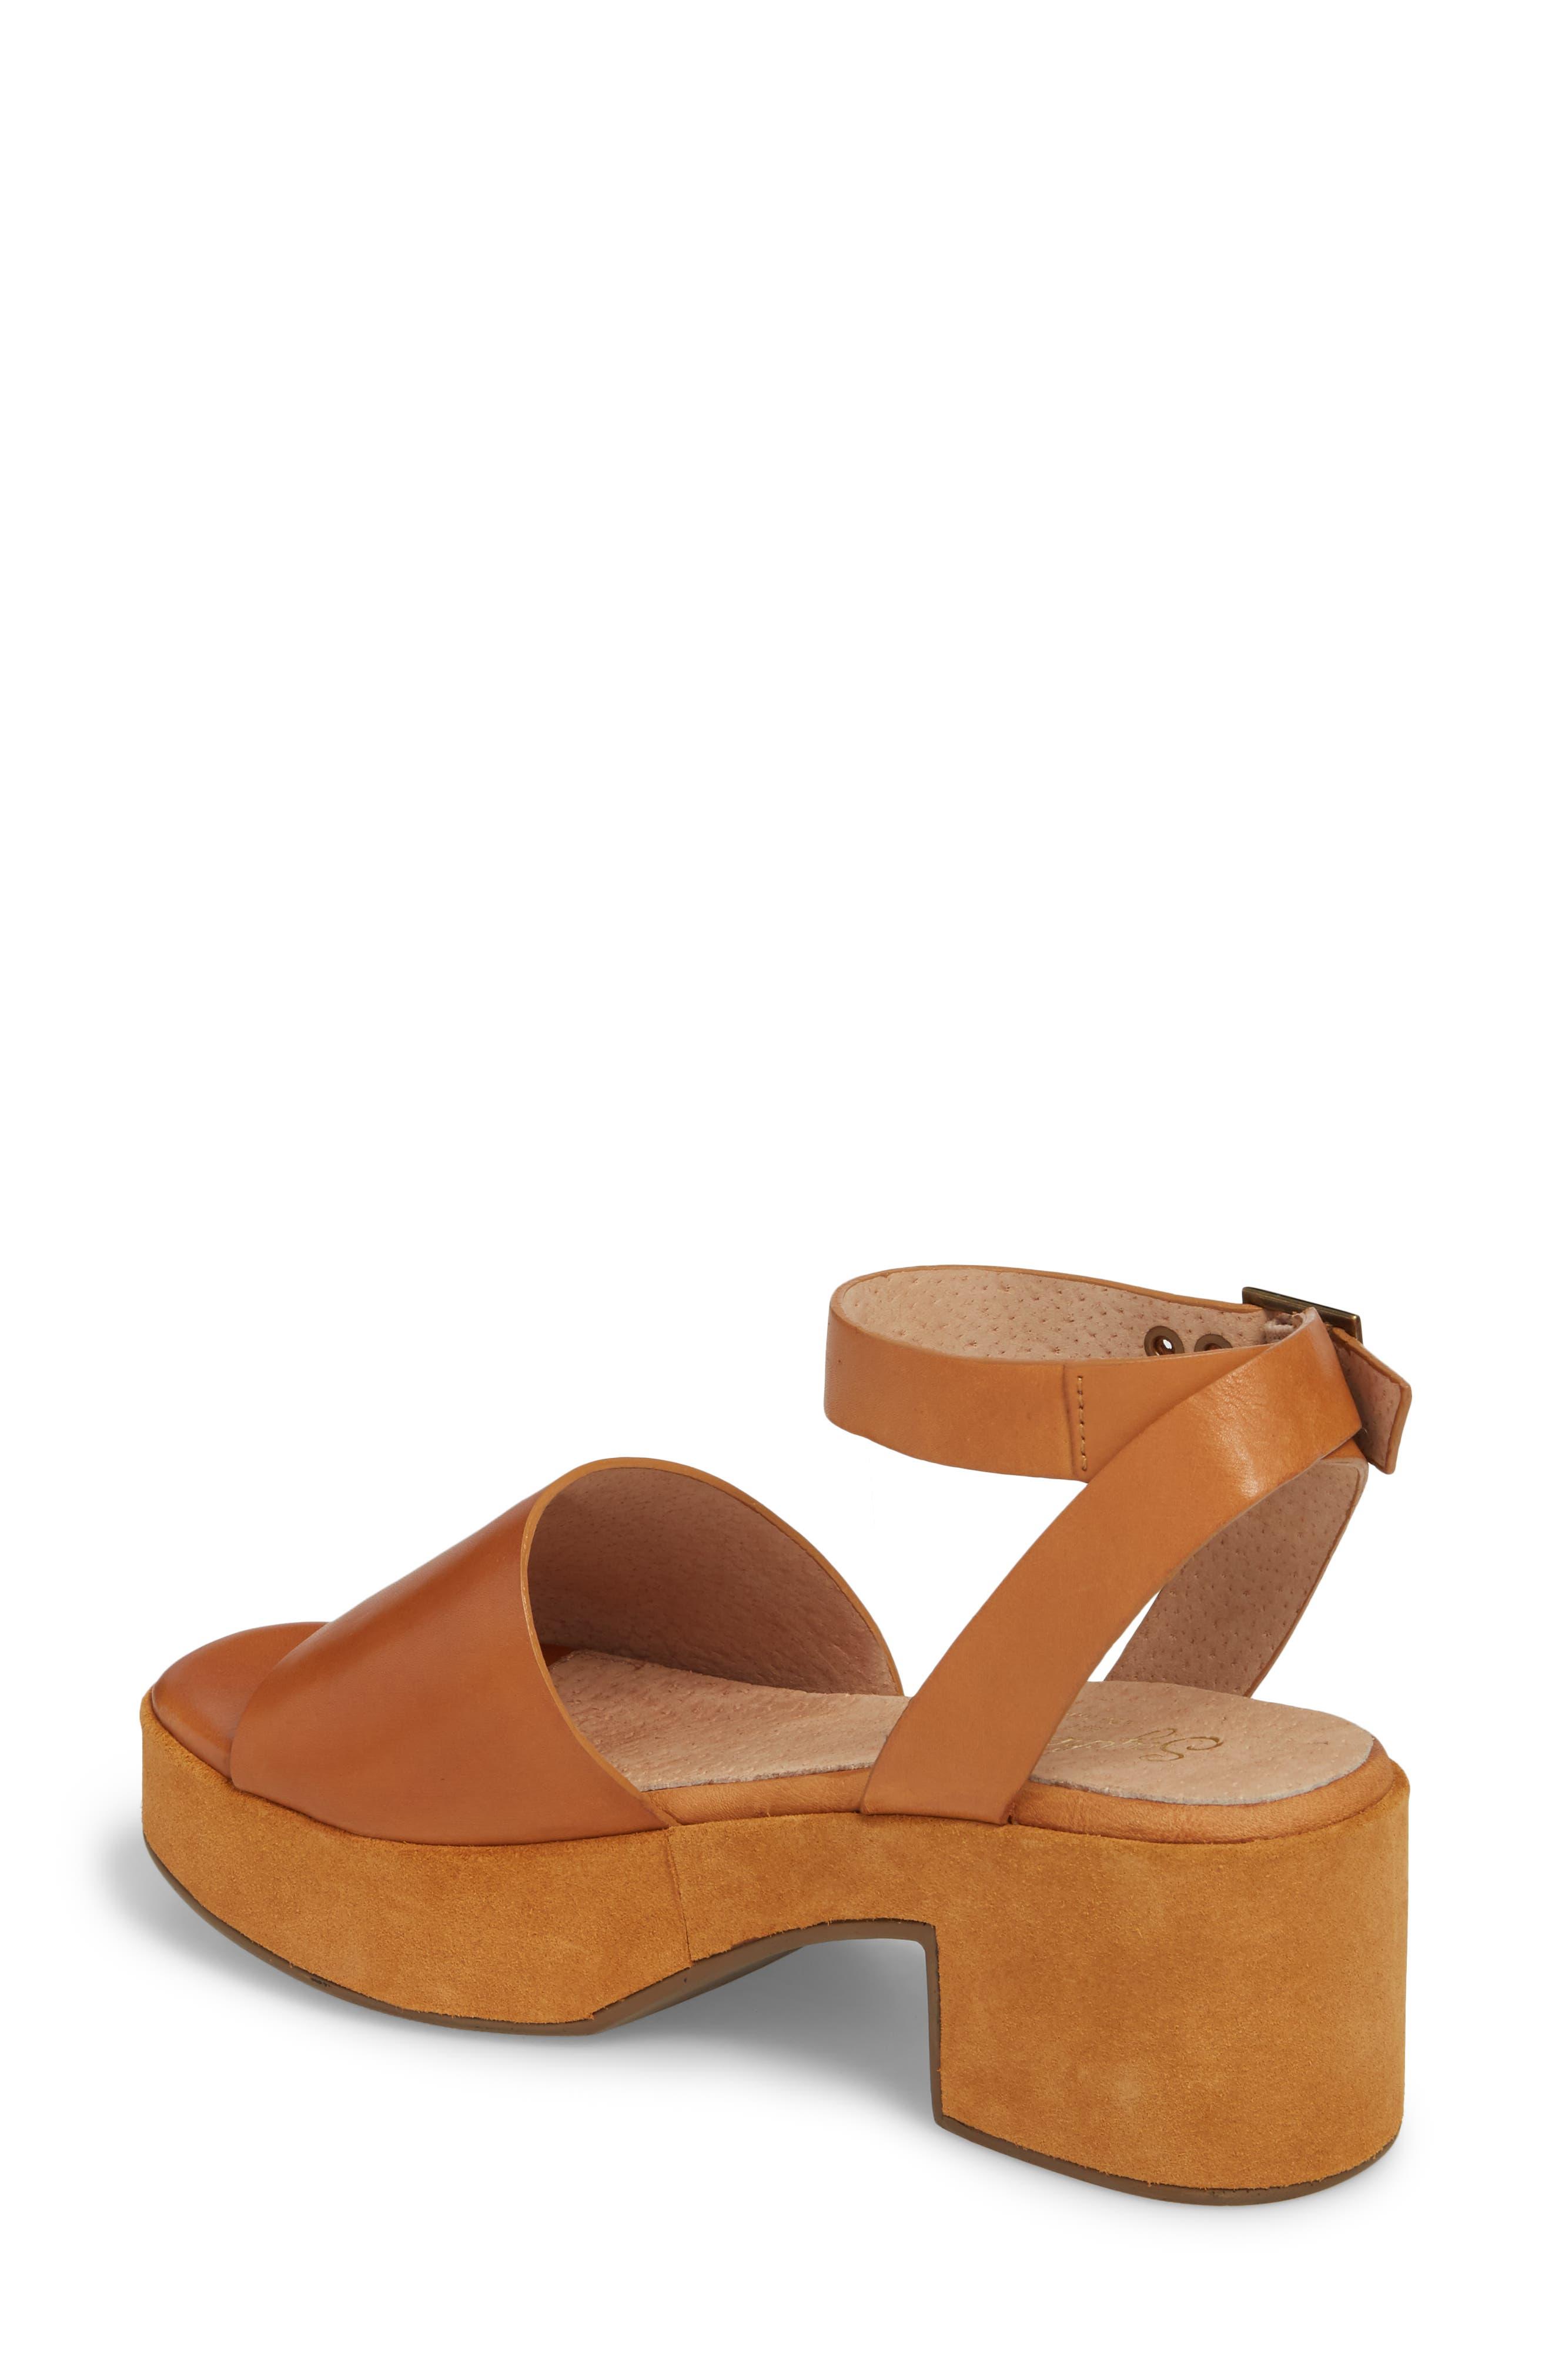 Calming Influence Platform Sandal,                             Alternate thumbnail 2, color,                             Tan Leather